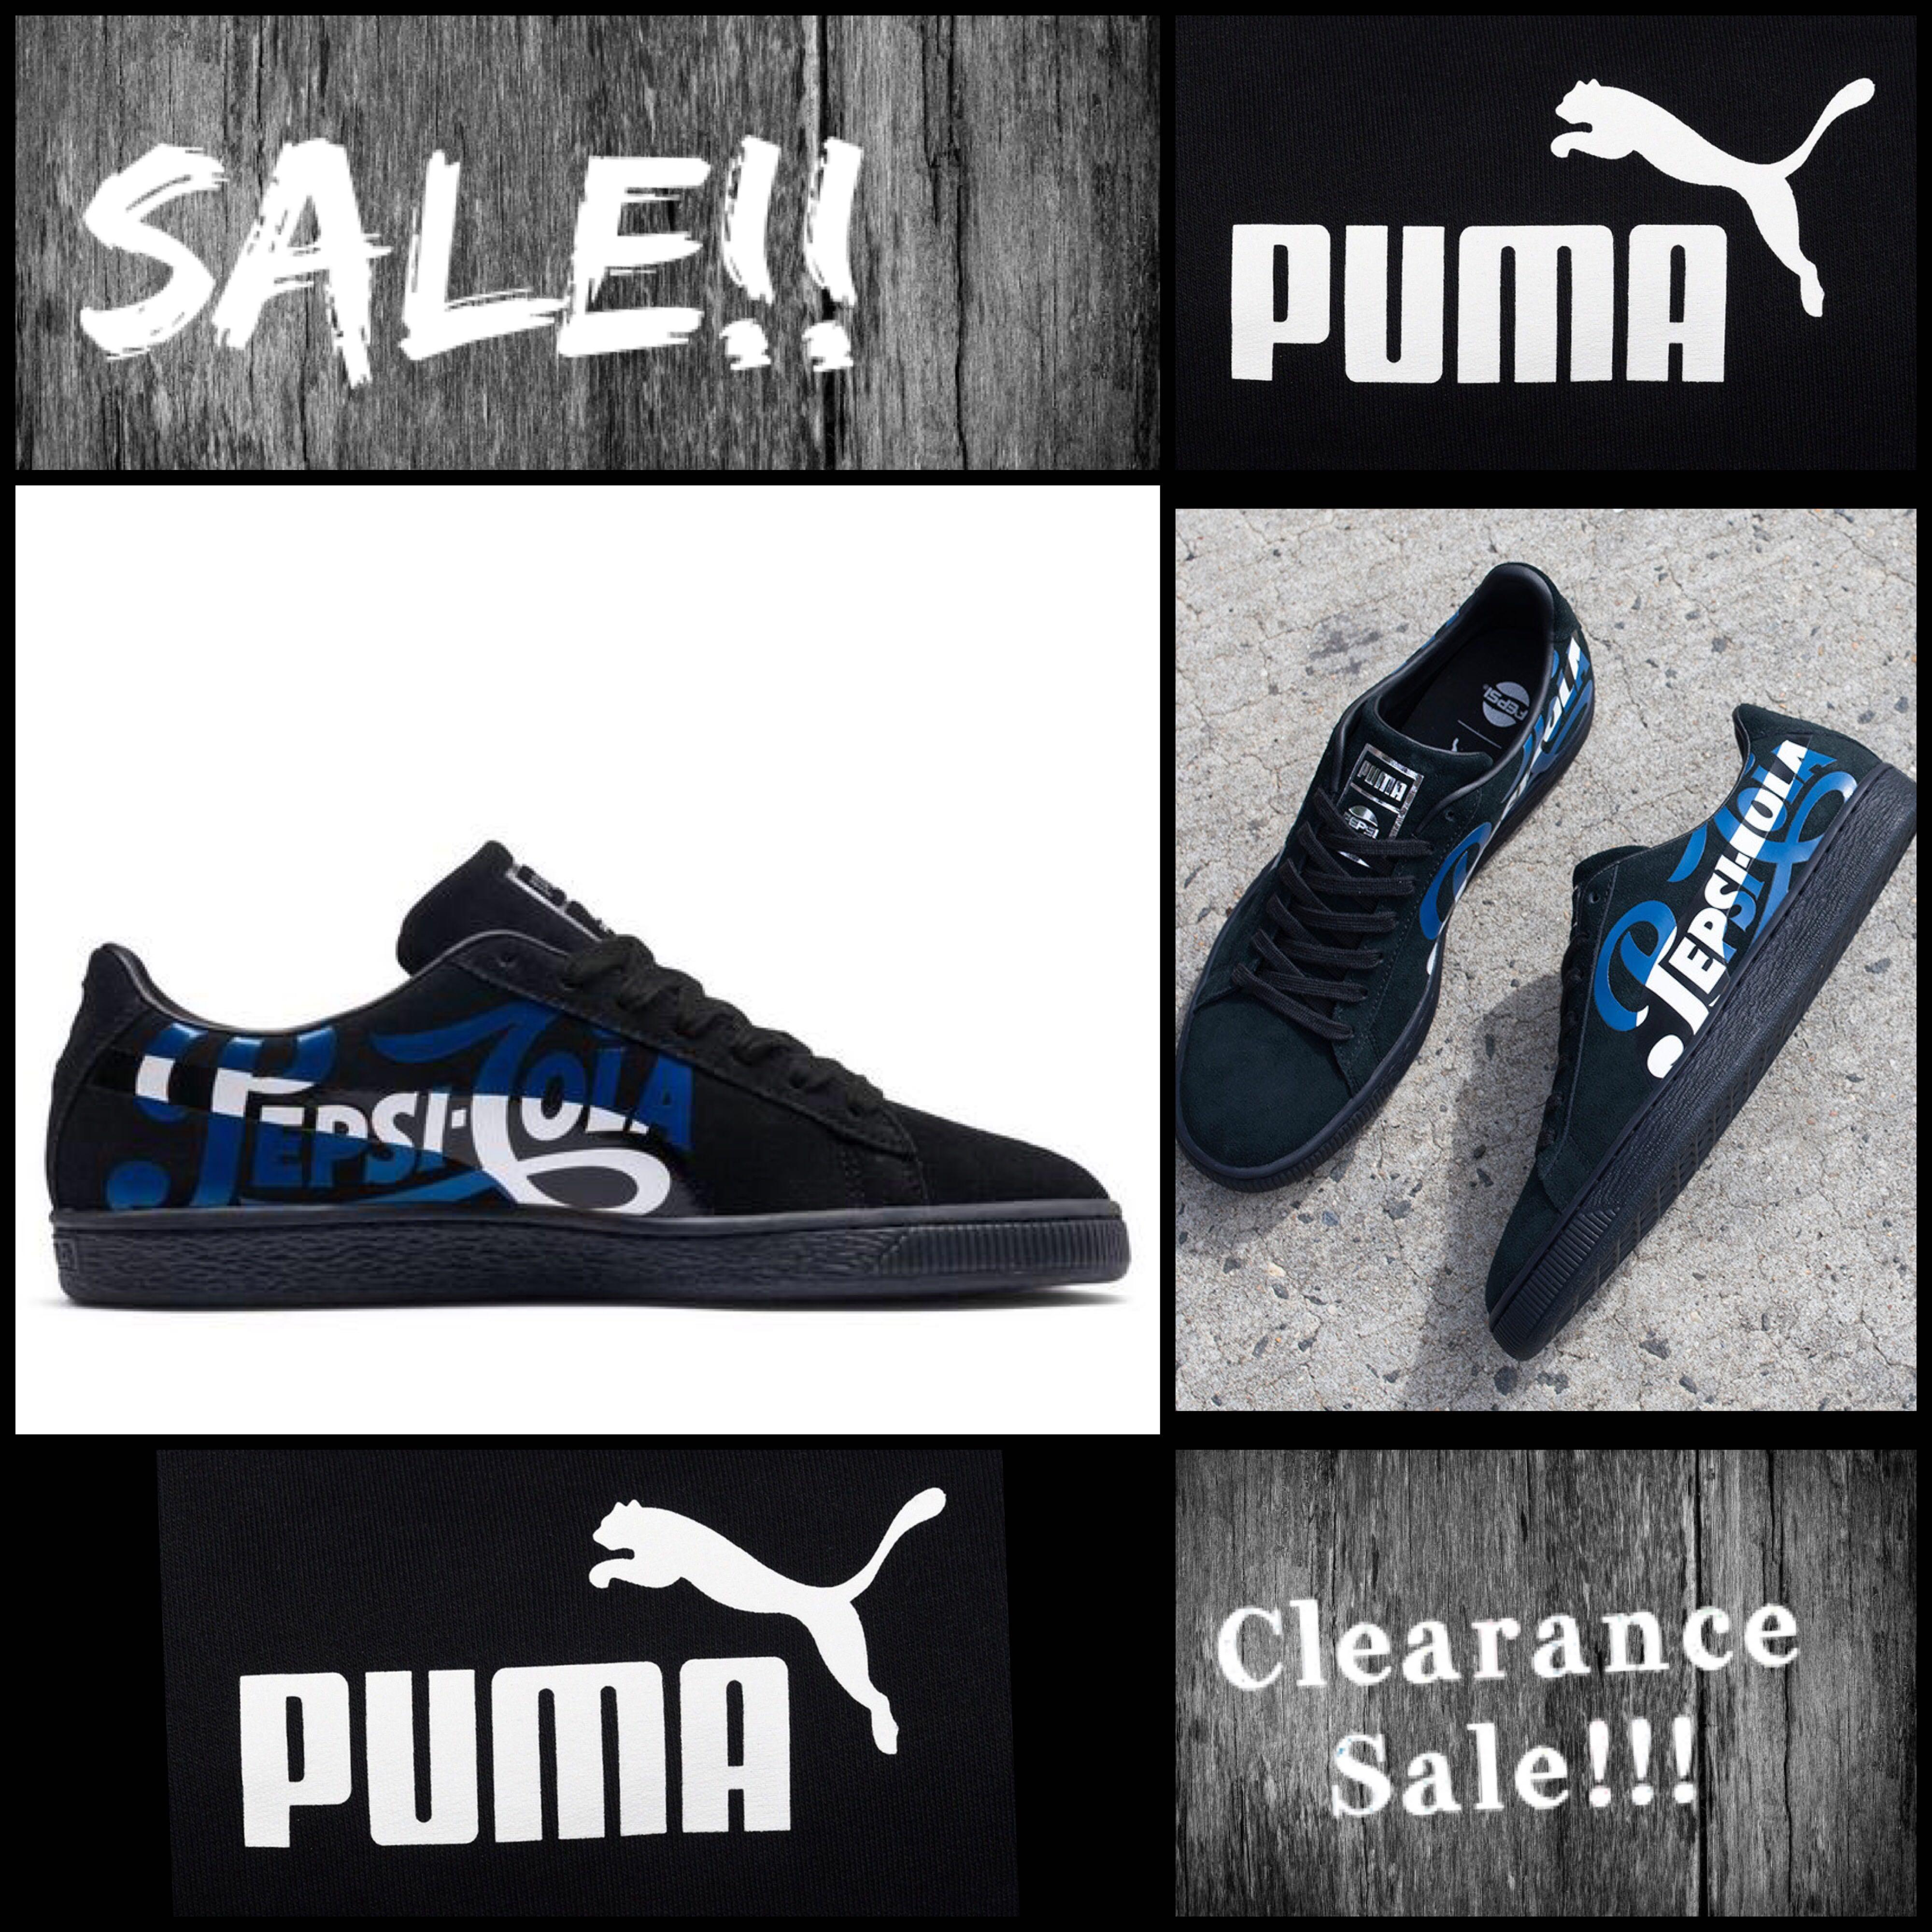 best website e059f 21b8e Puma Pepsi Cola in Black, Men's Fashion, Footwear, Sneakers ...